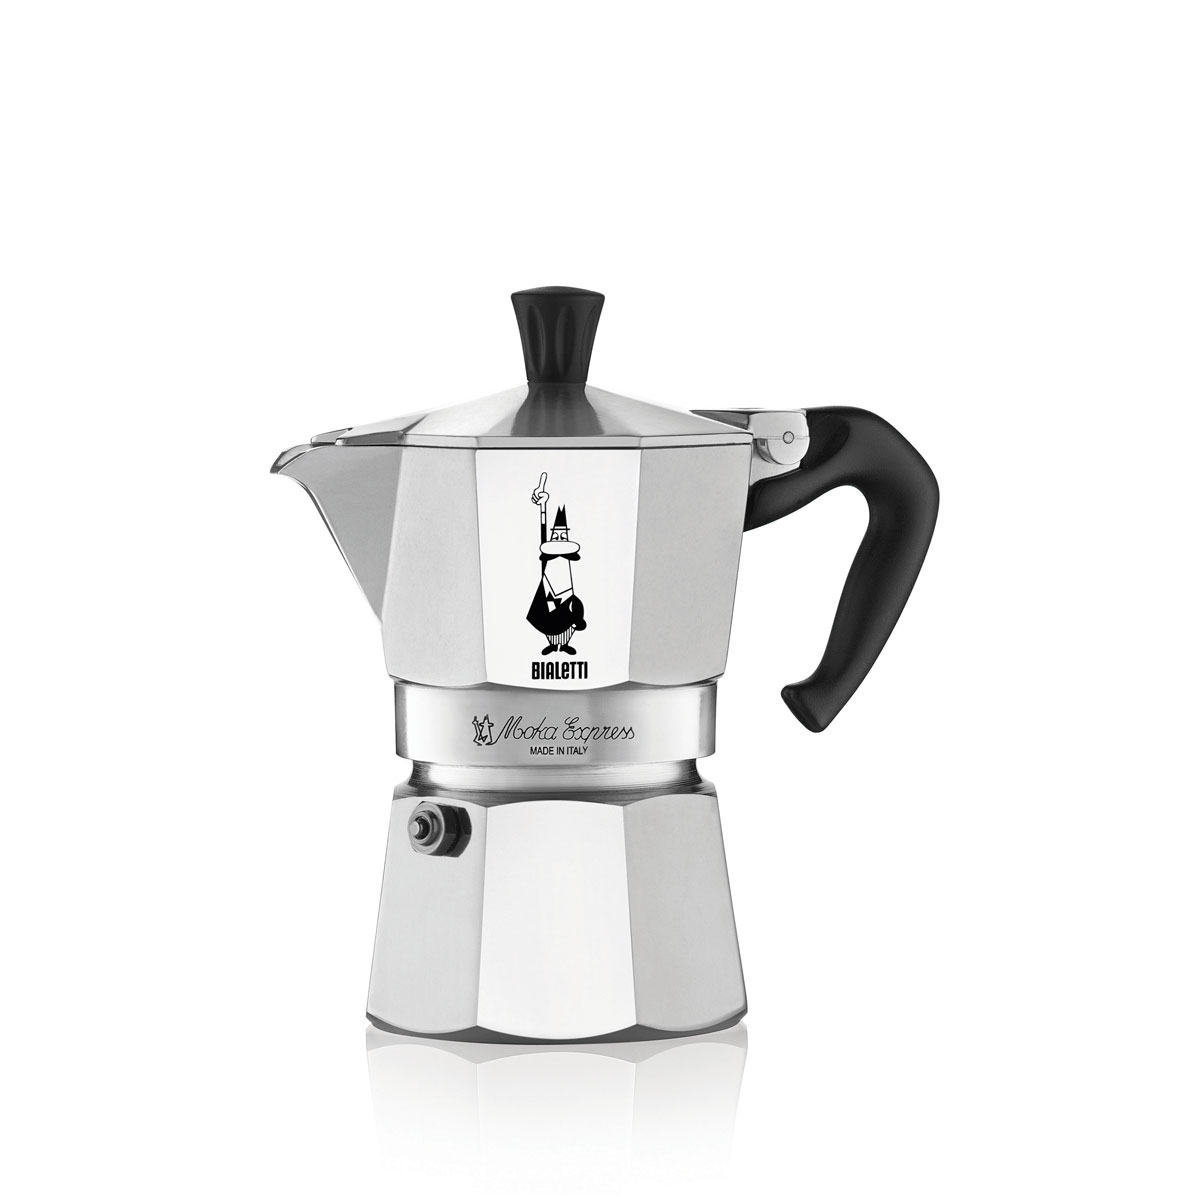 Espressokocher (3 Tassen)